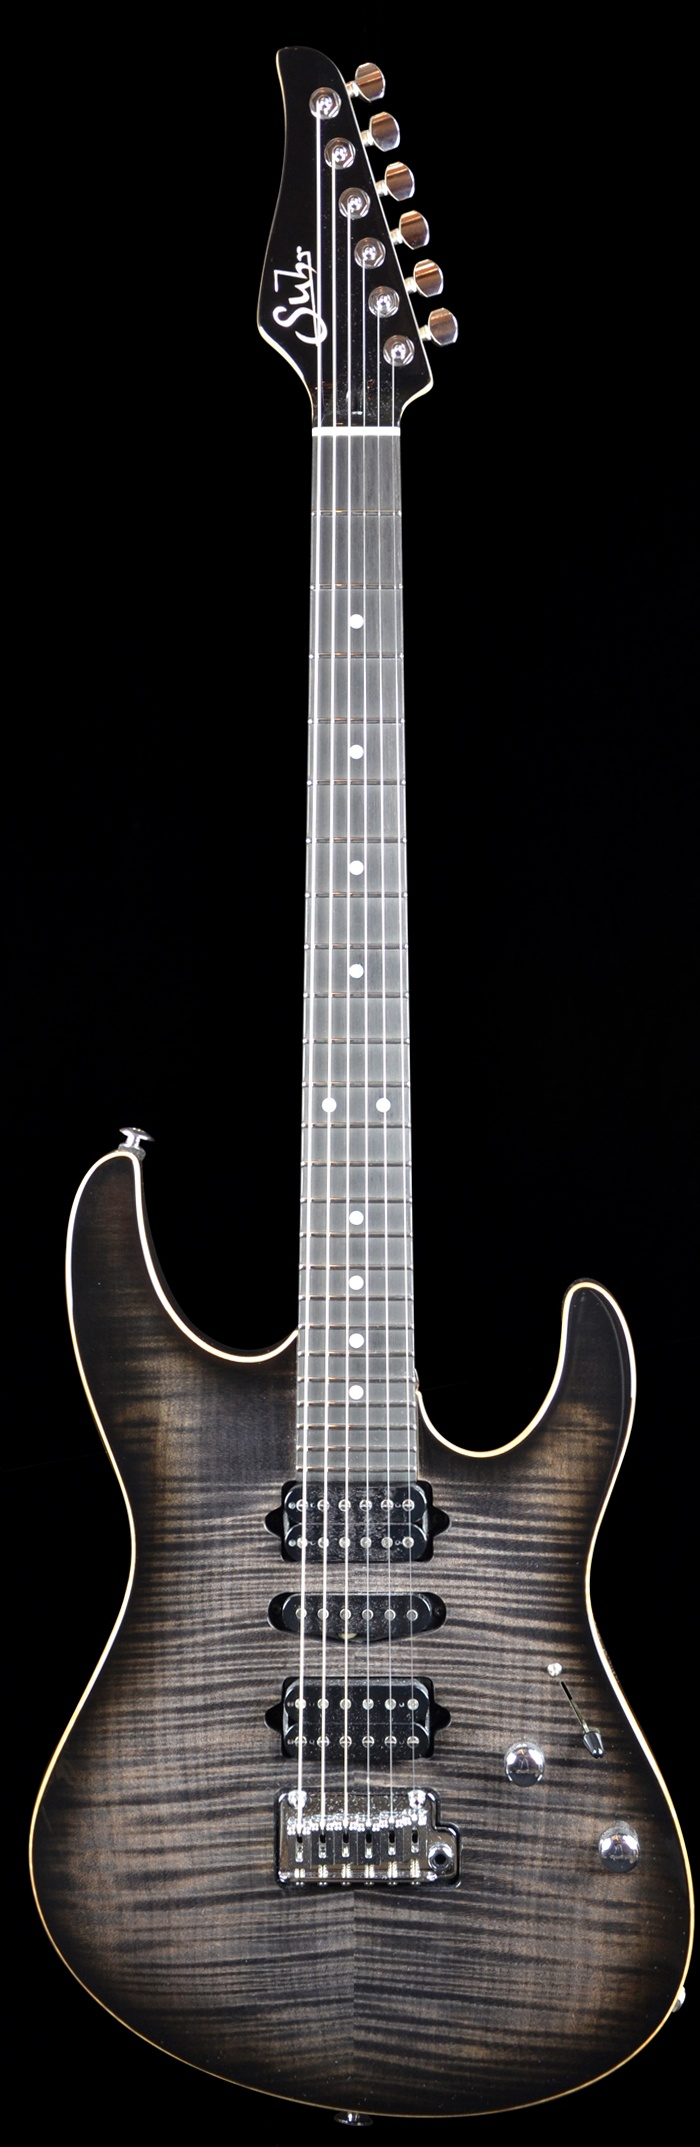 8 Best Music Instruments Images On Pinterest Emg707 Ibanez Wiring Help Sevenstringorg Guitars